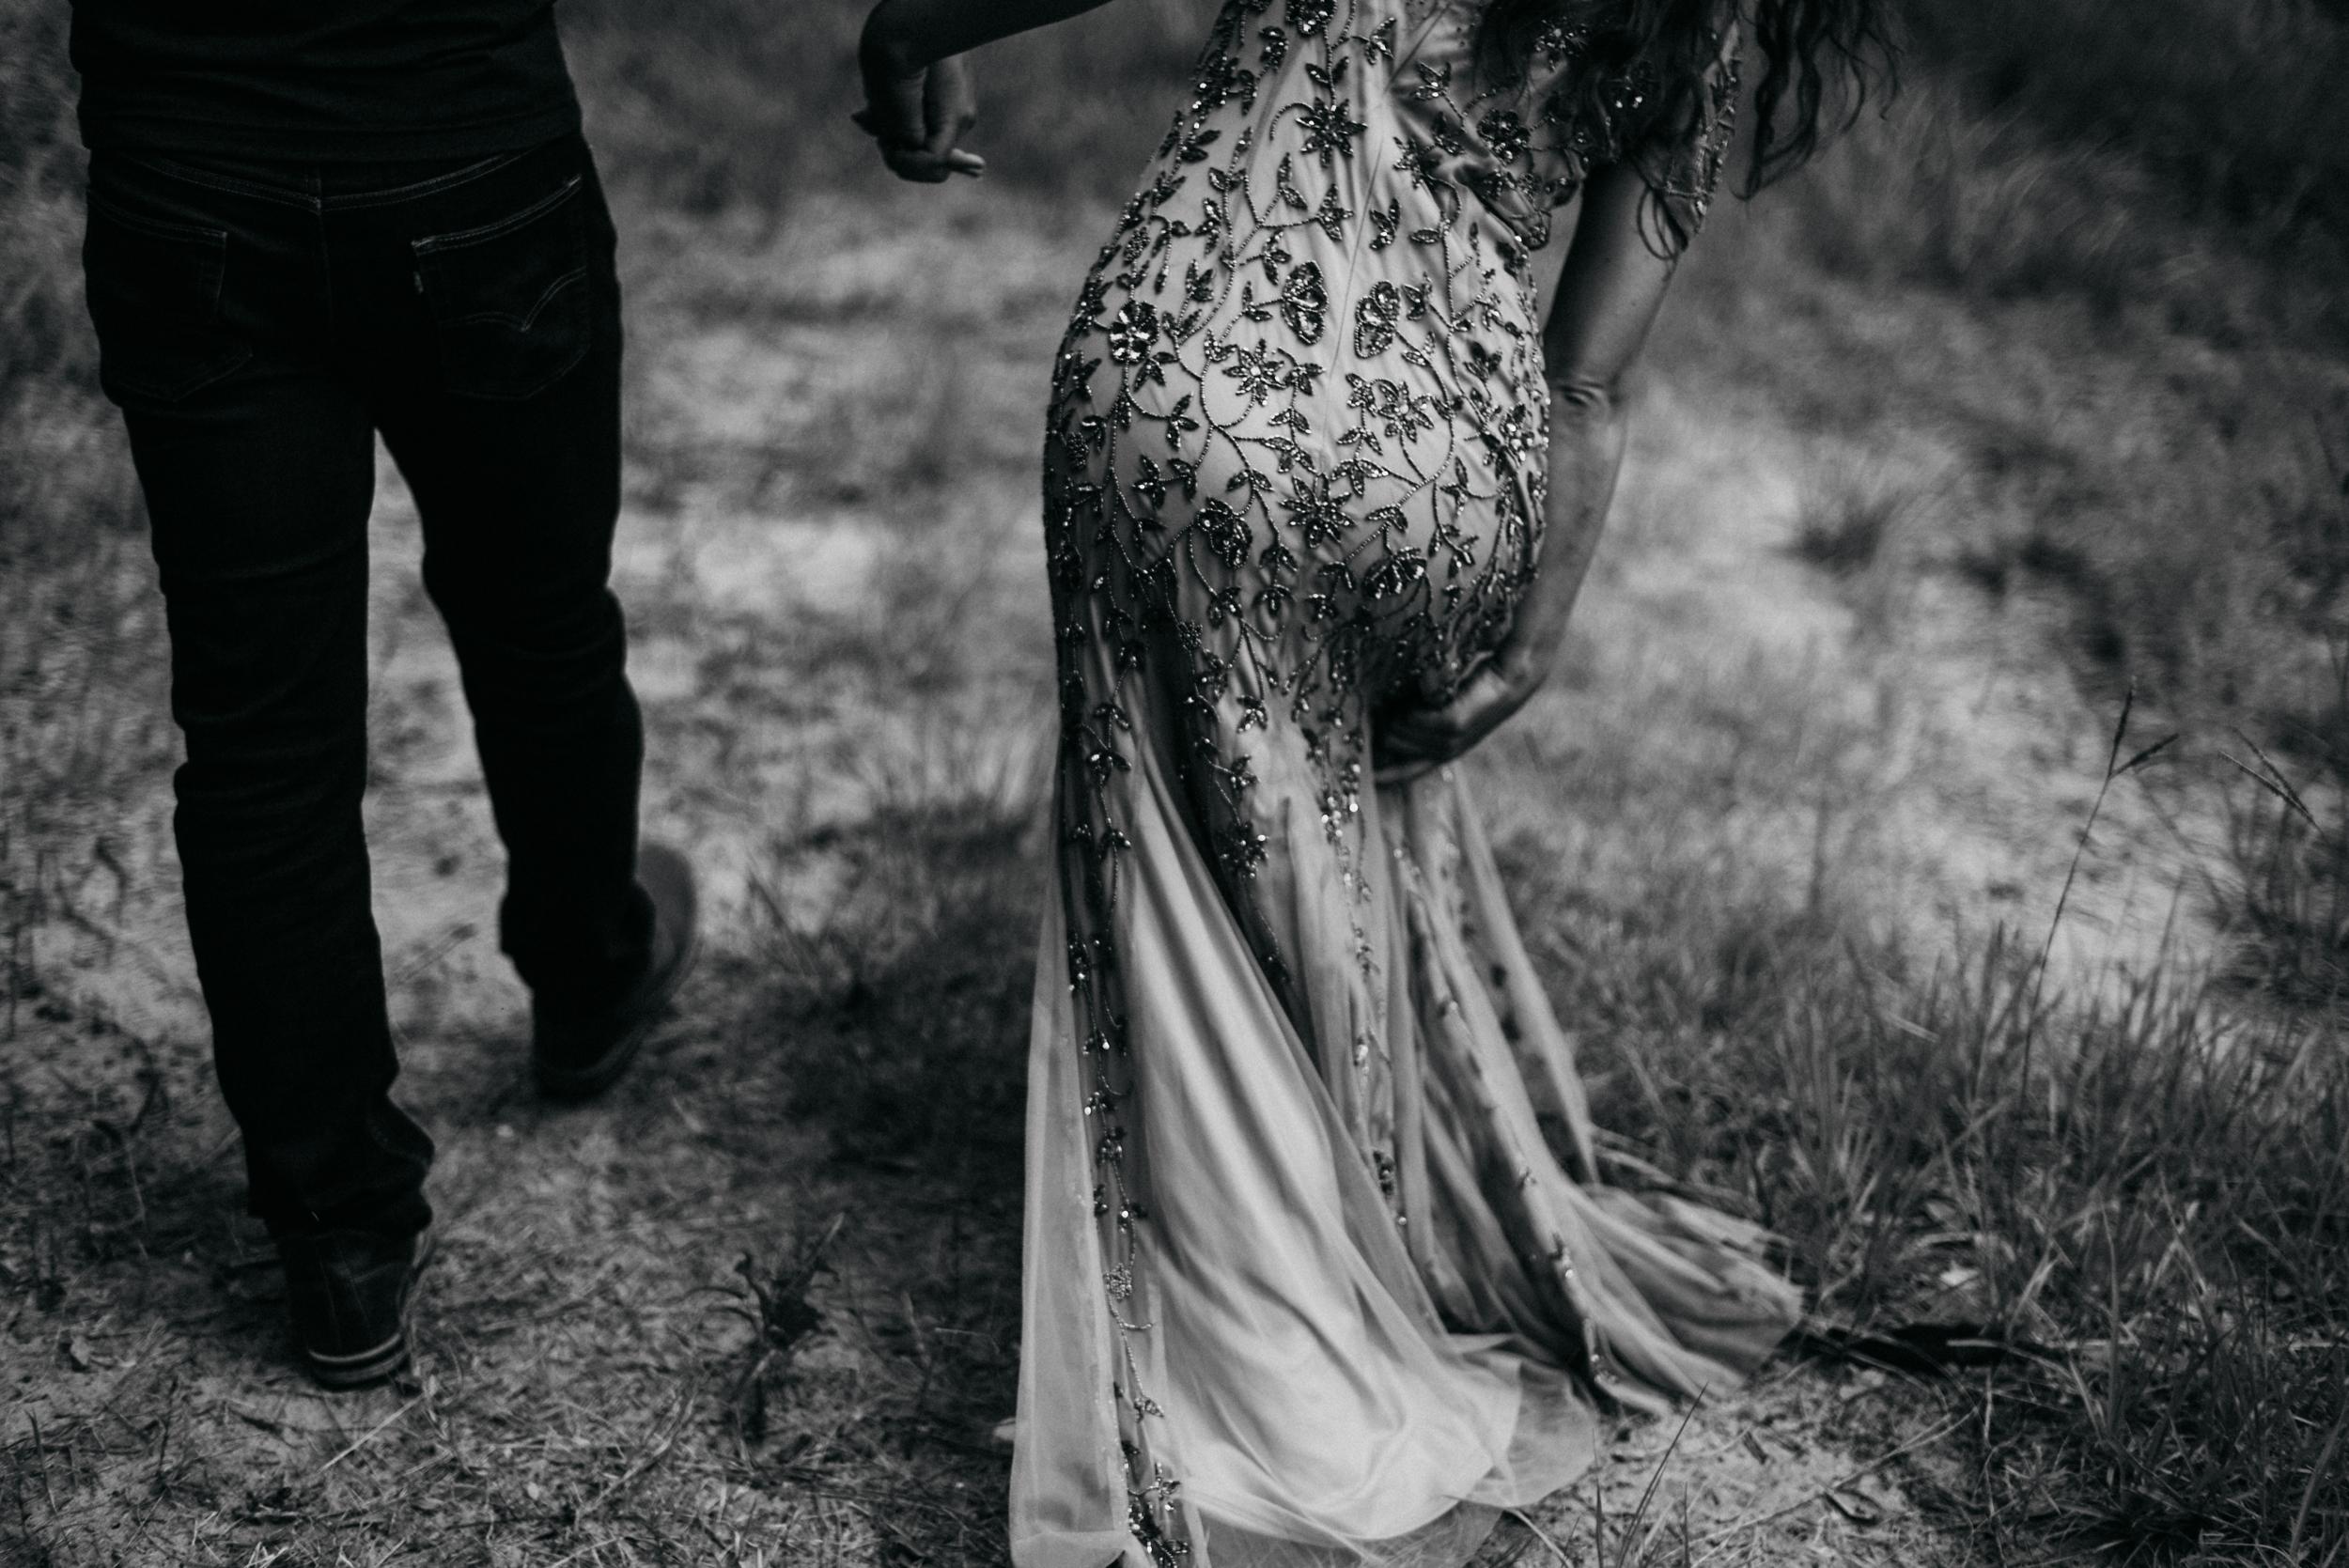 desiree-gardner-photography-pairs-france-monet-garden-monets-couple-wedding-engagement-giverny-30-a-30a-florida_0059.jpg